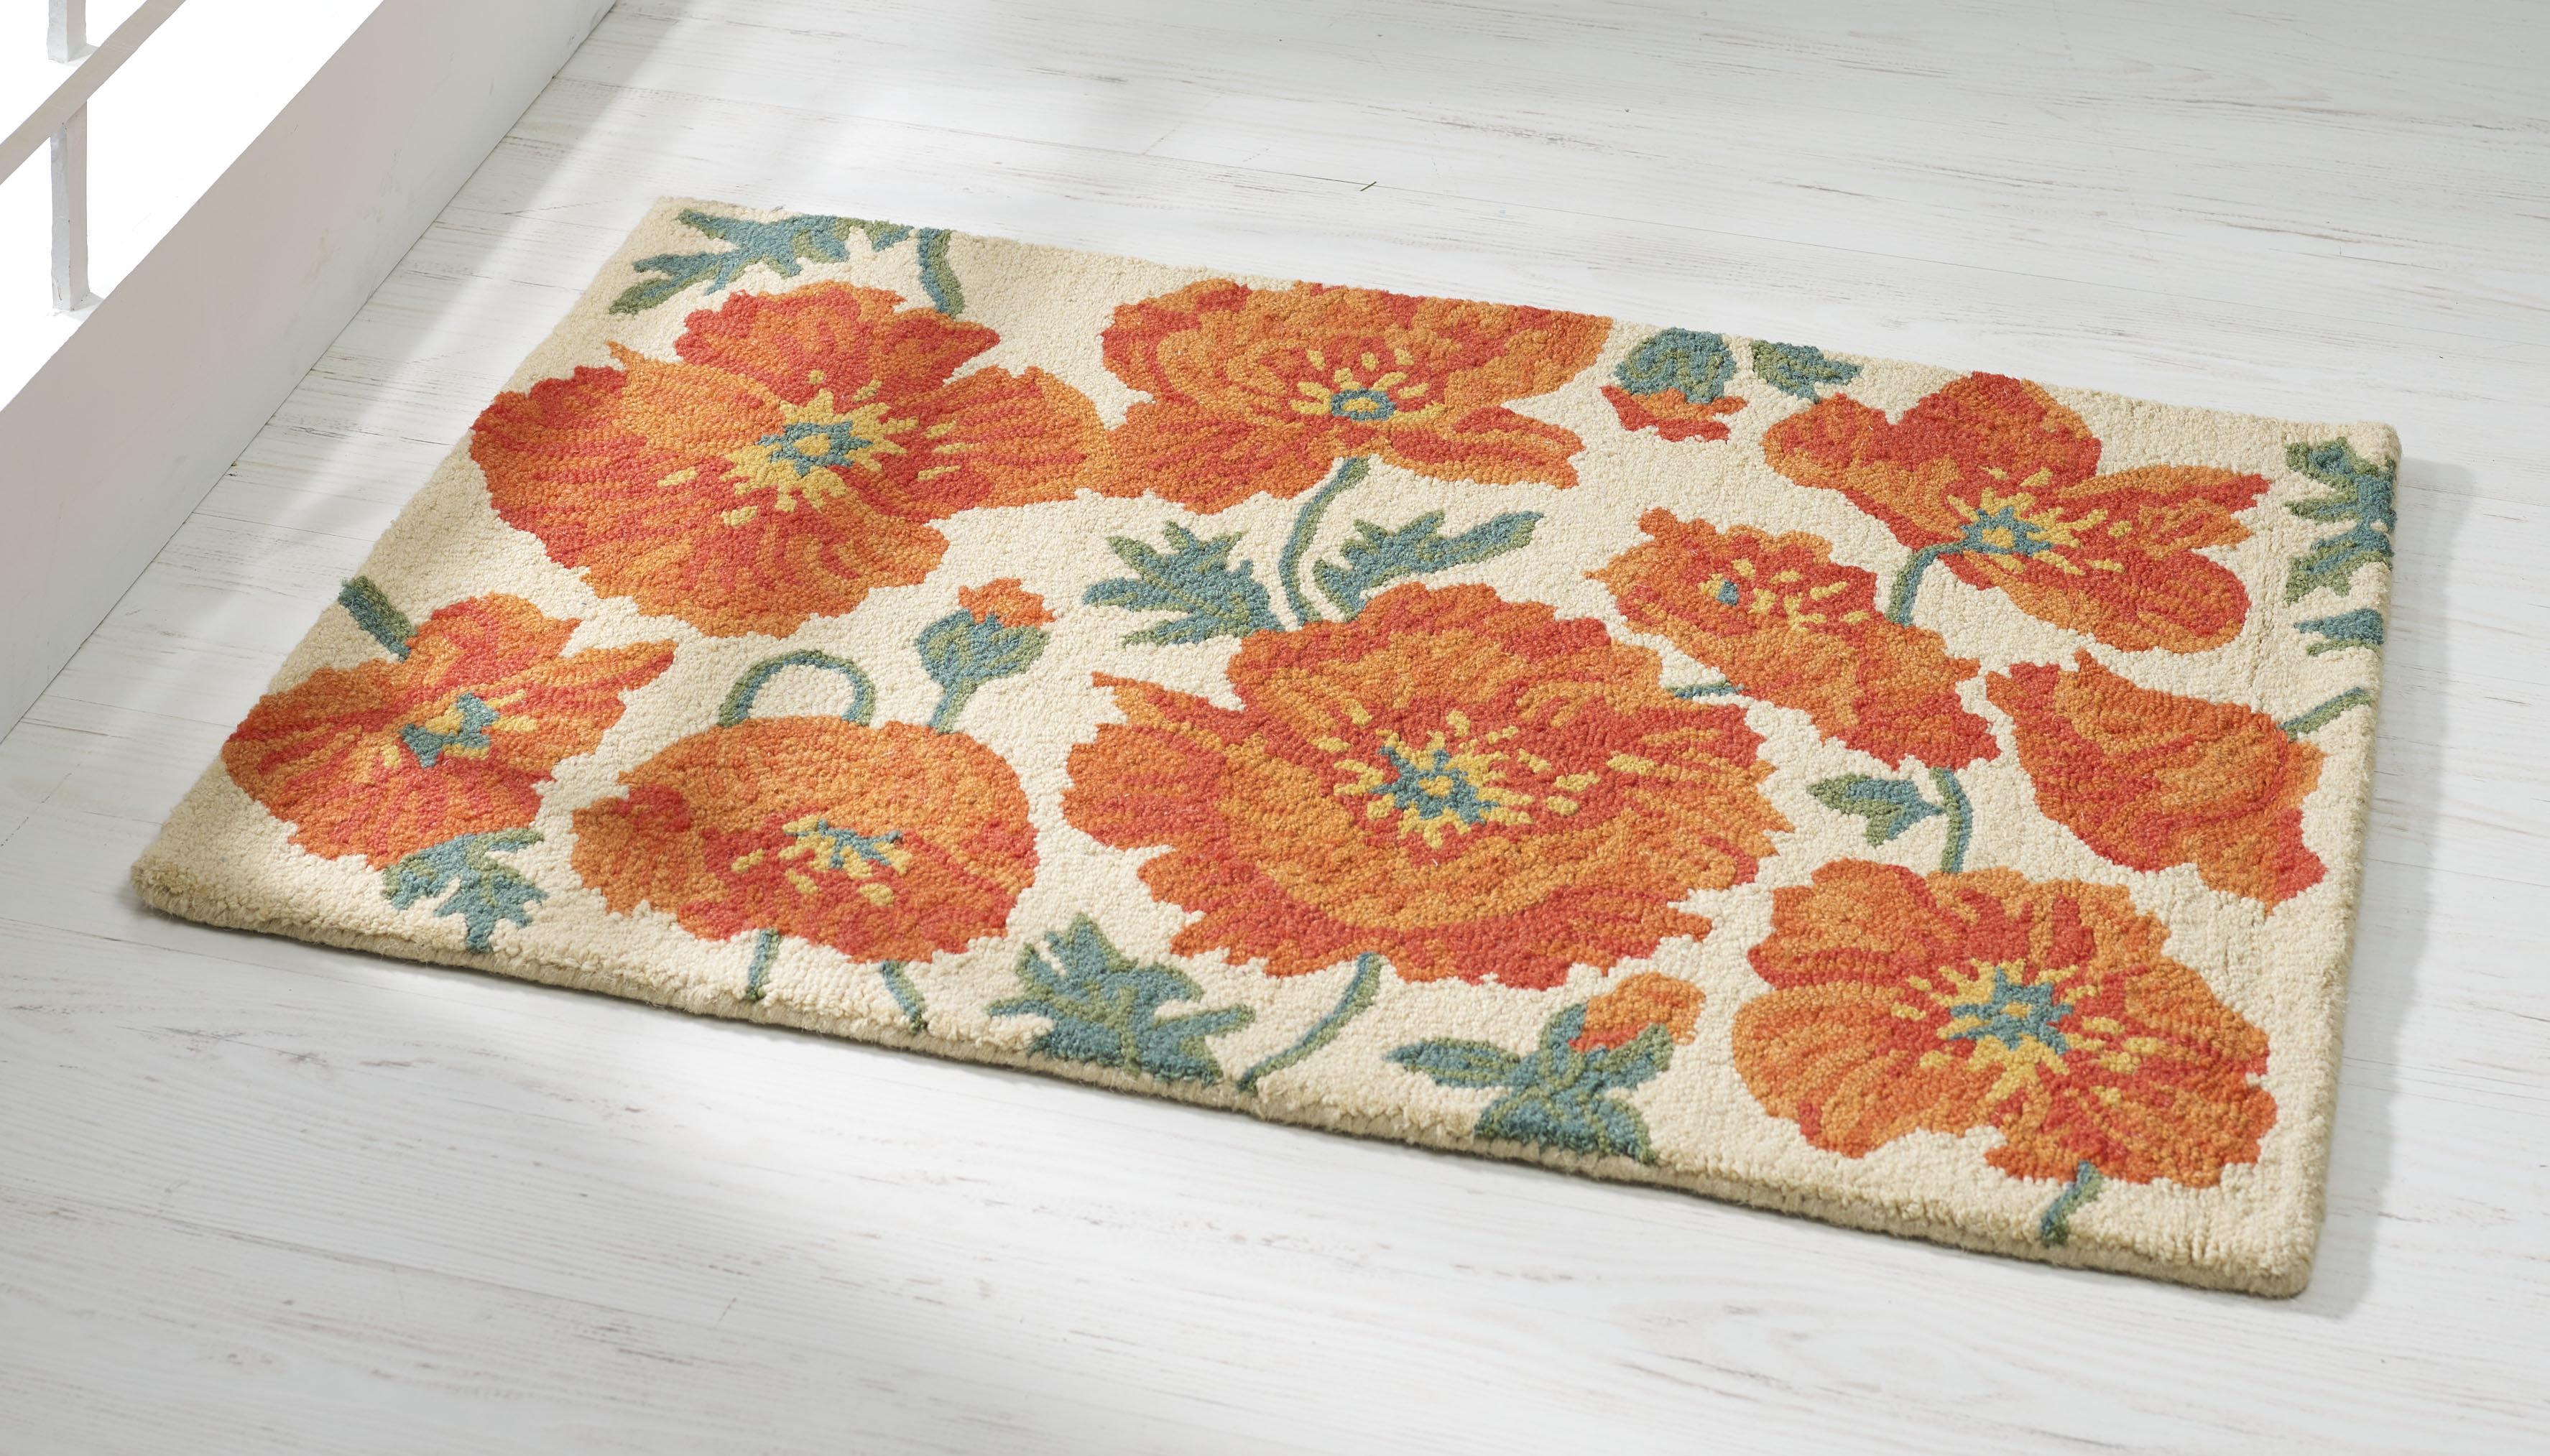 Hflt Floral Handmade Hooked Wool Orange Area Rug Wayfair